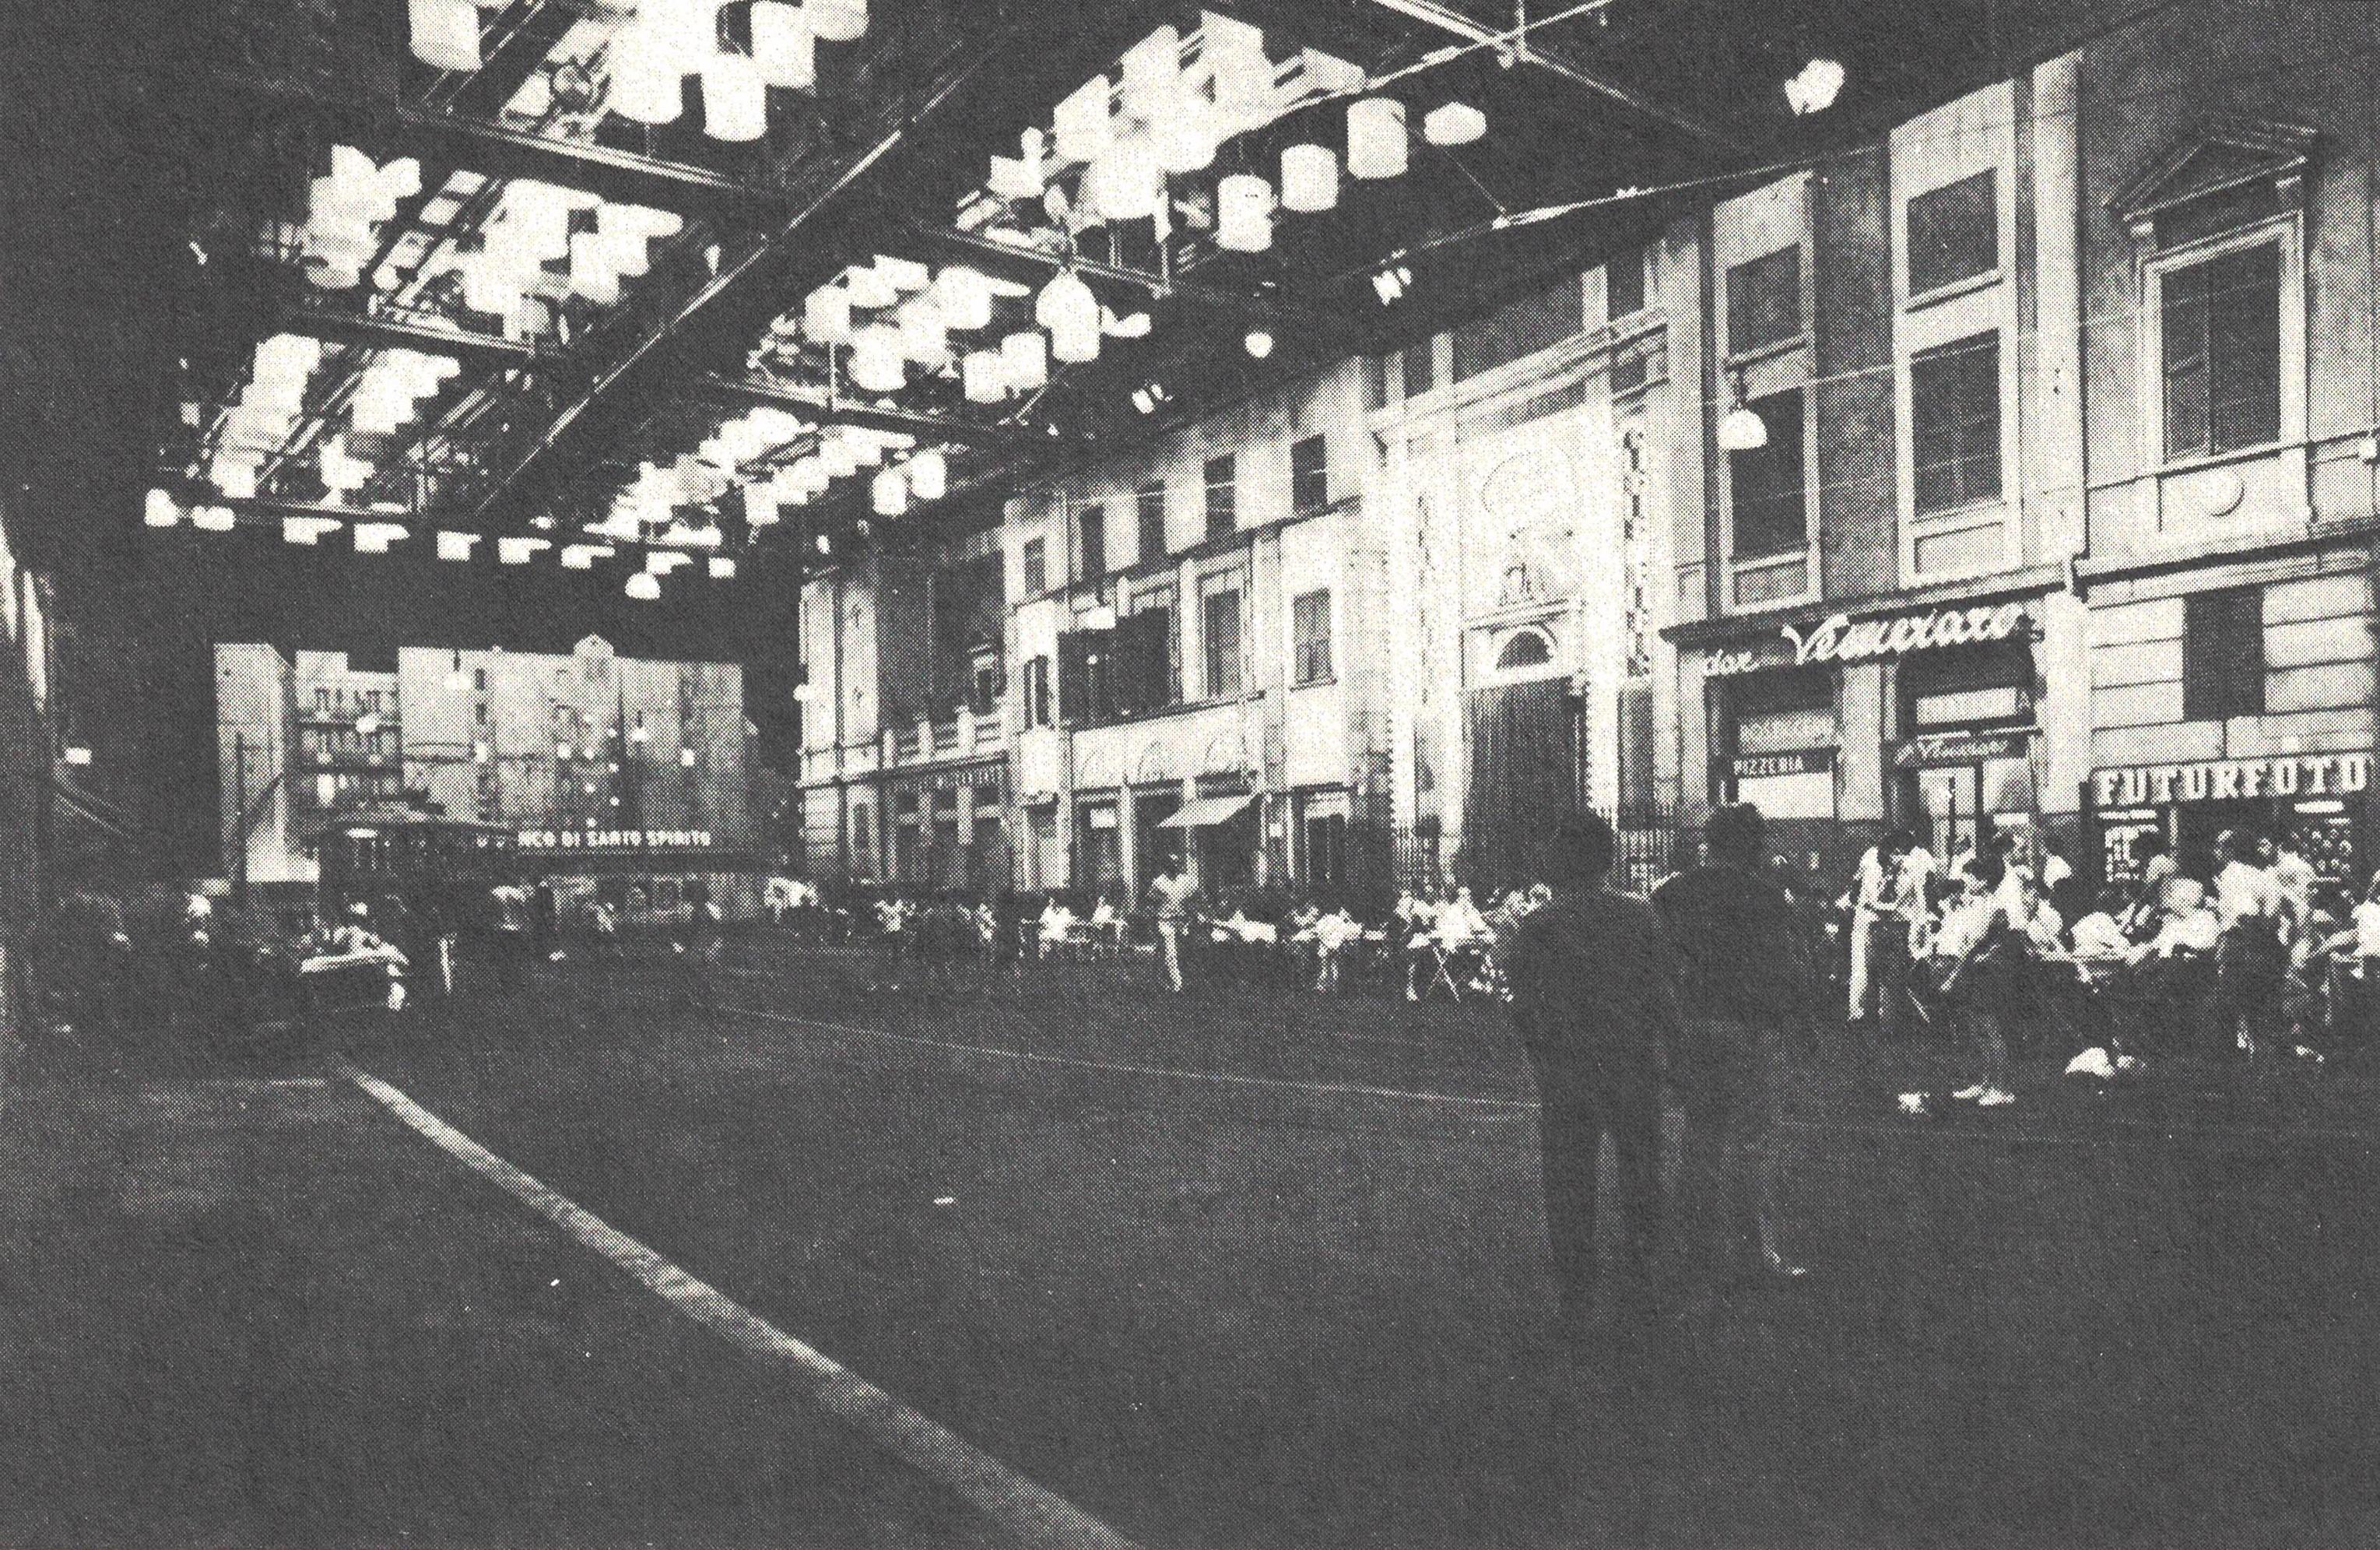 Figura 3. Roma de Fellini: flagrante de intervalo das filmagens